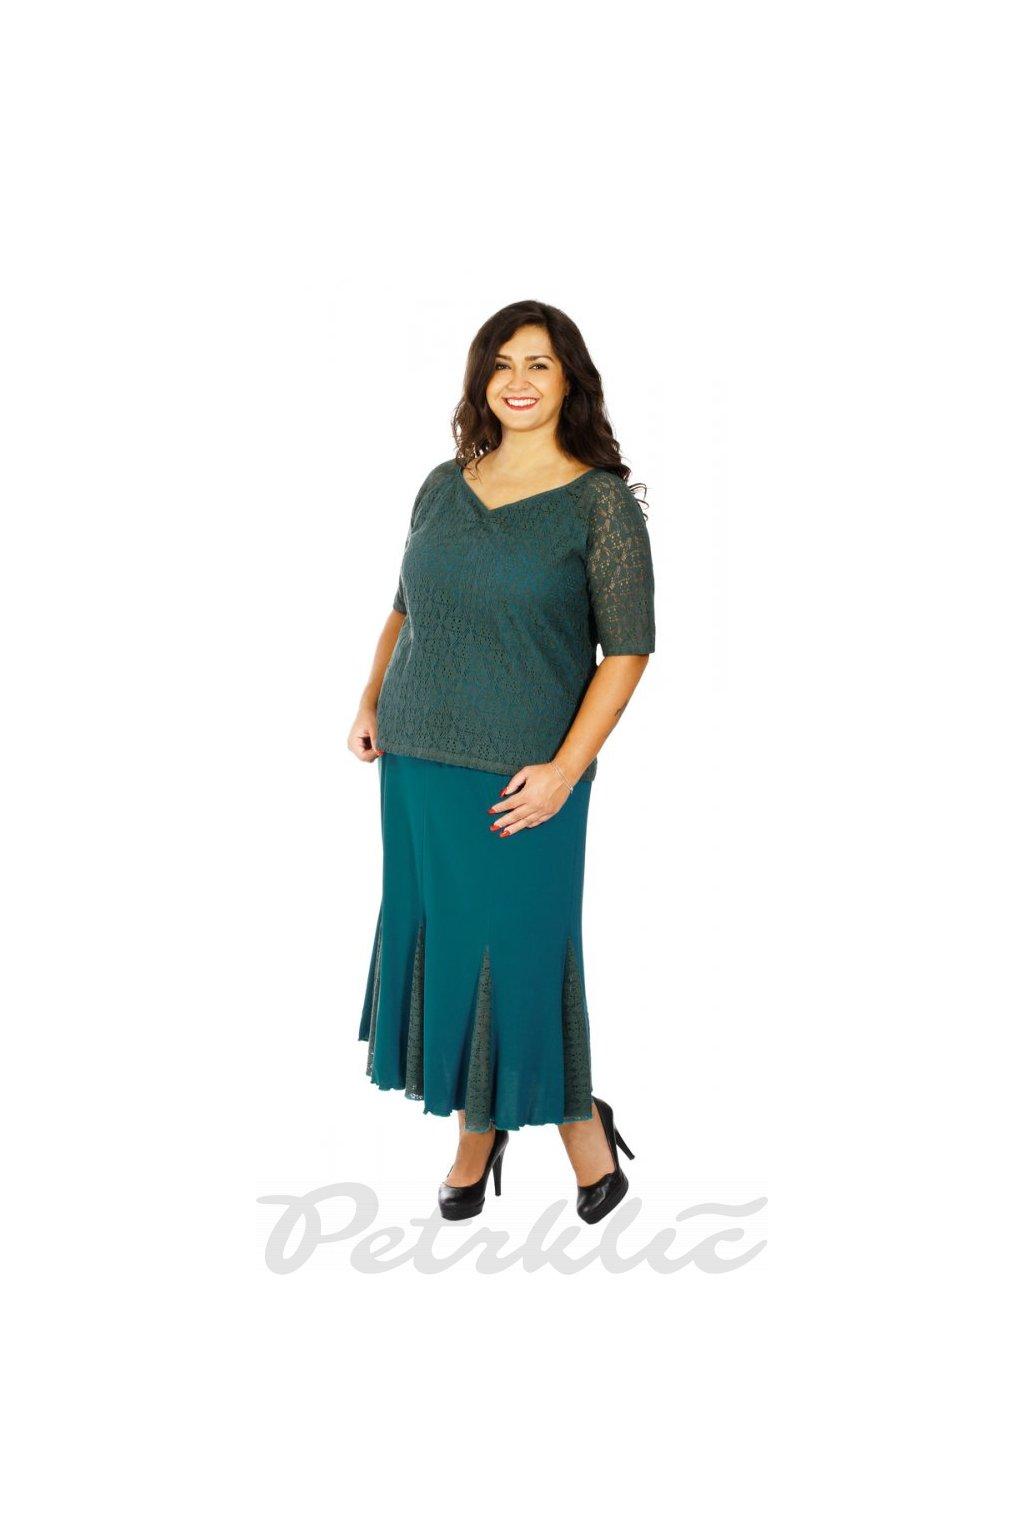 ZDENA - sukně s krajkou 70 - 75 cm